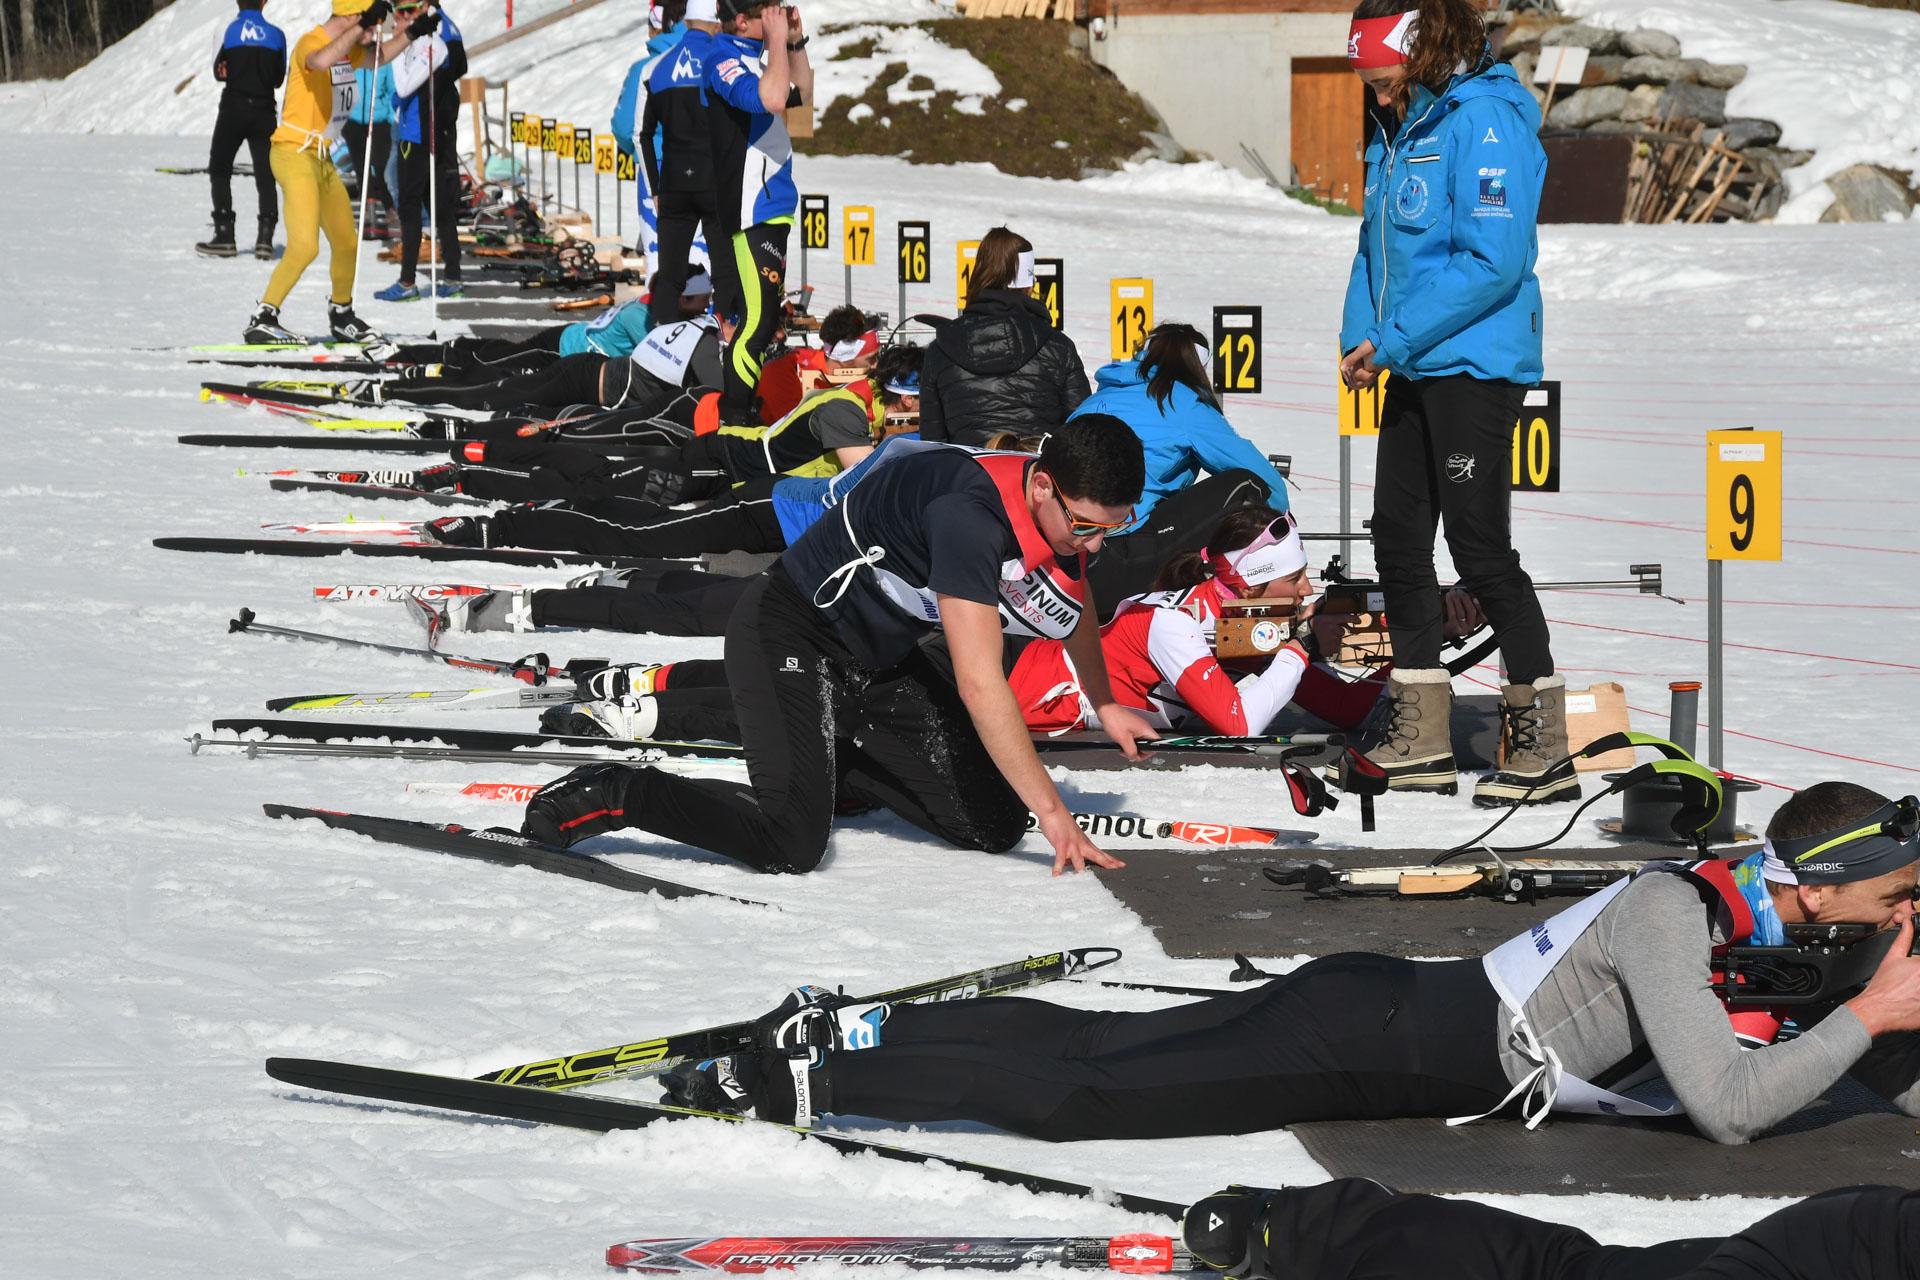 Alpinum-Biathlon-Impulse-Tour-2019©JulieRuly_233